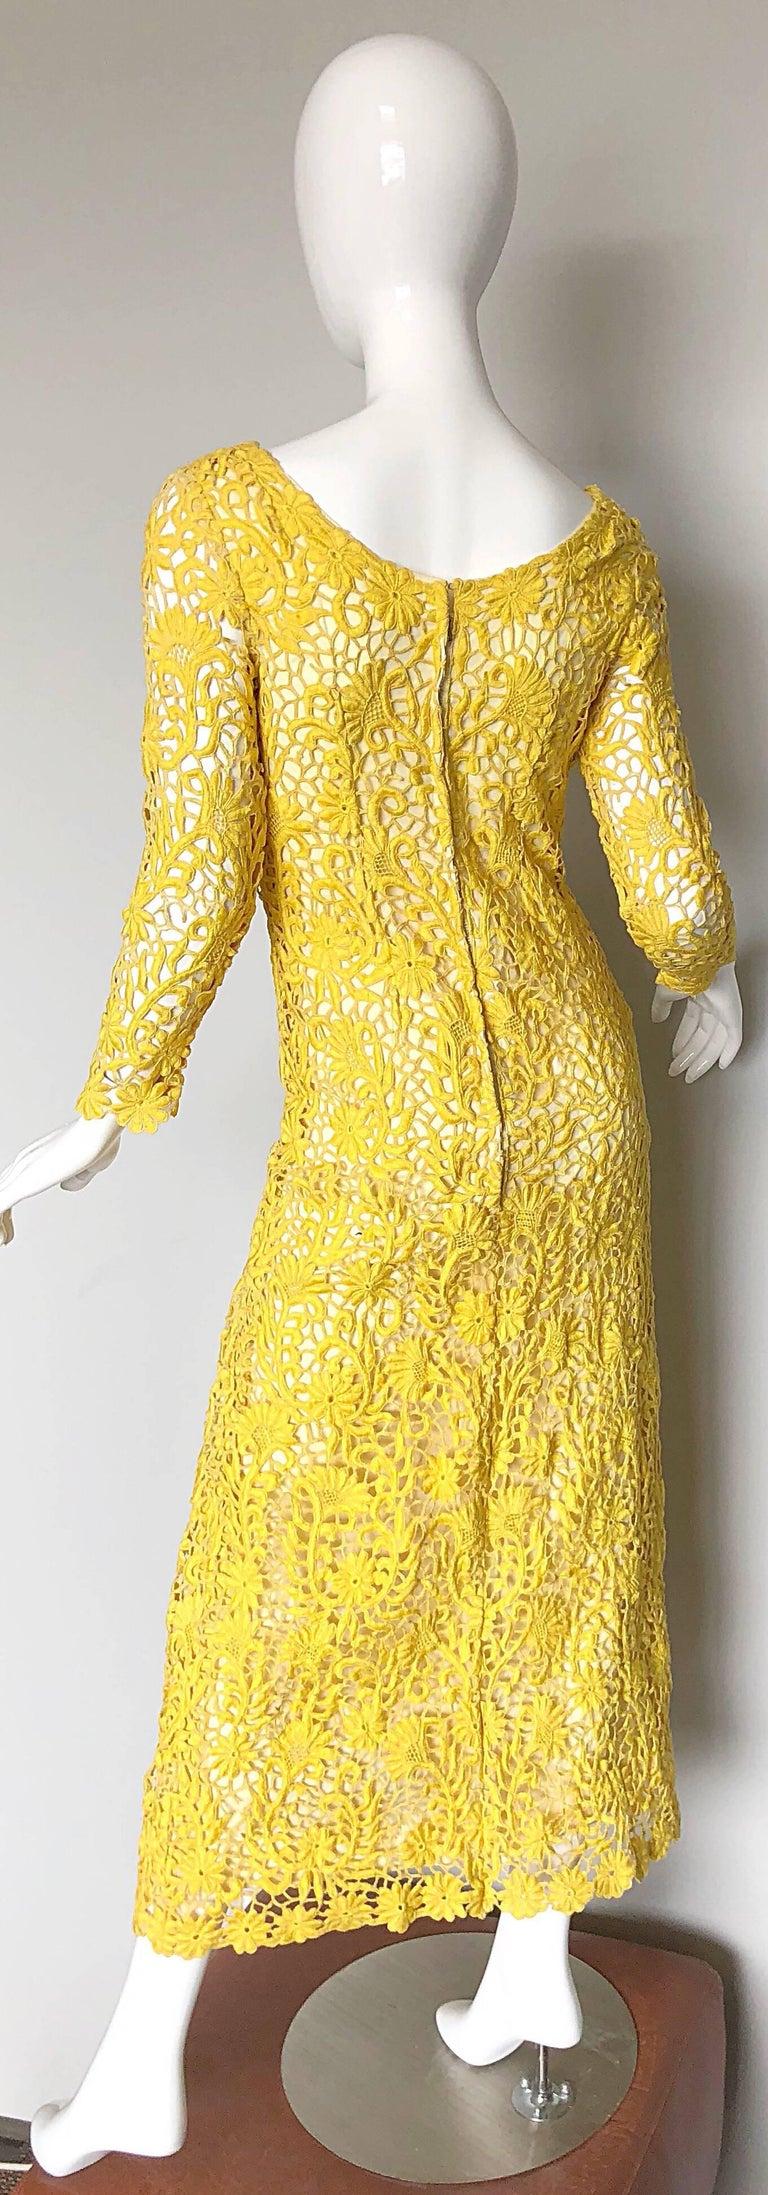 a9c67006139 Joe Salazar Rare 1960s Canary Yellow Hand Crochet Vintage 60s Maxi Dress  Gown For Sale 4